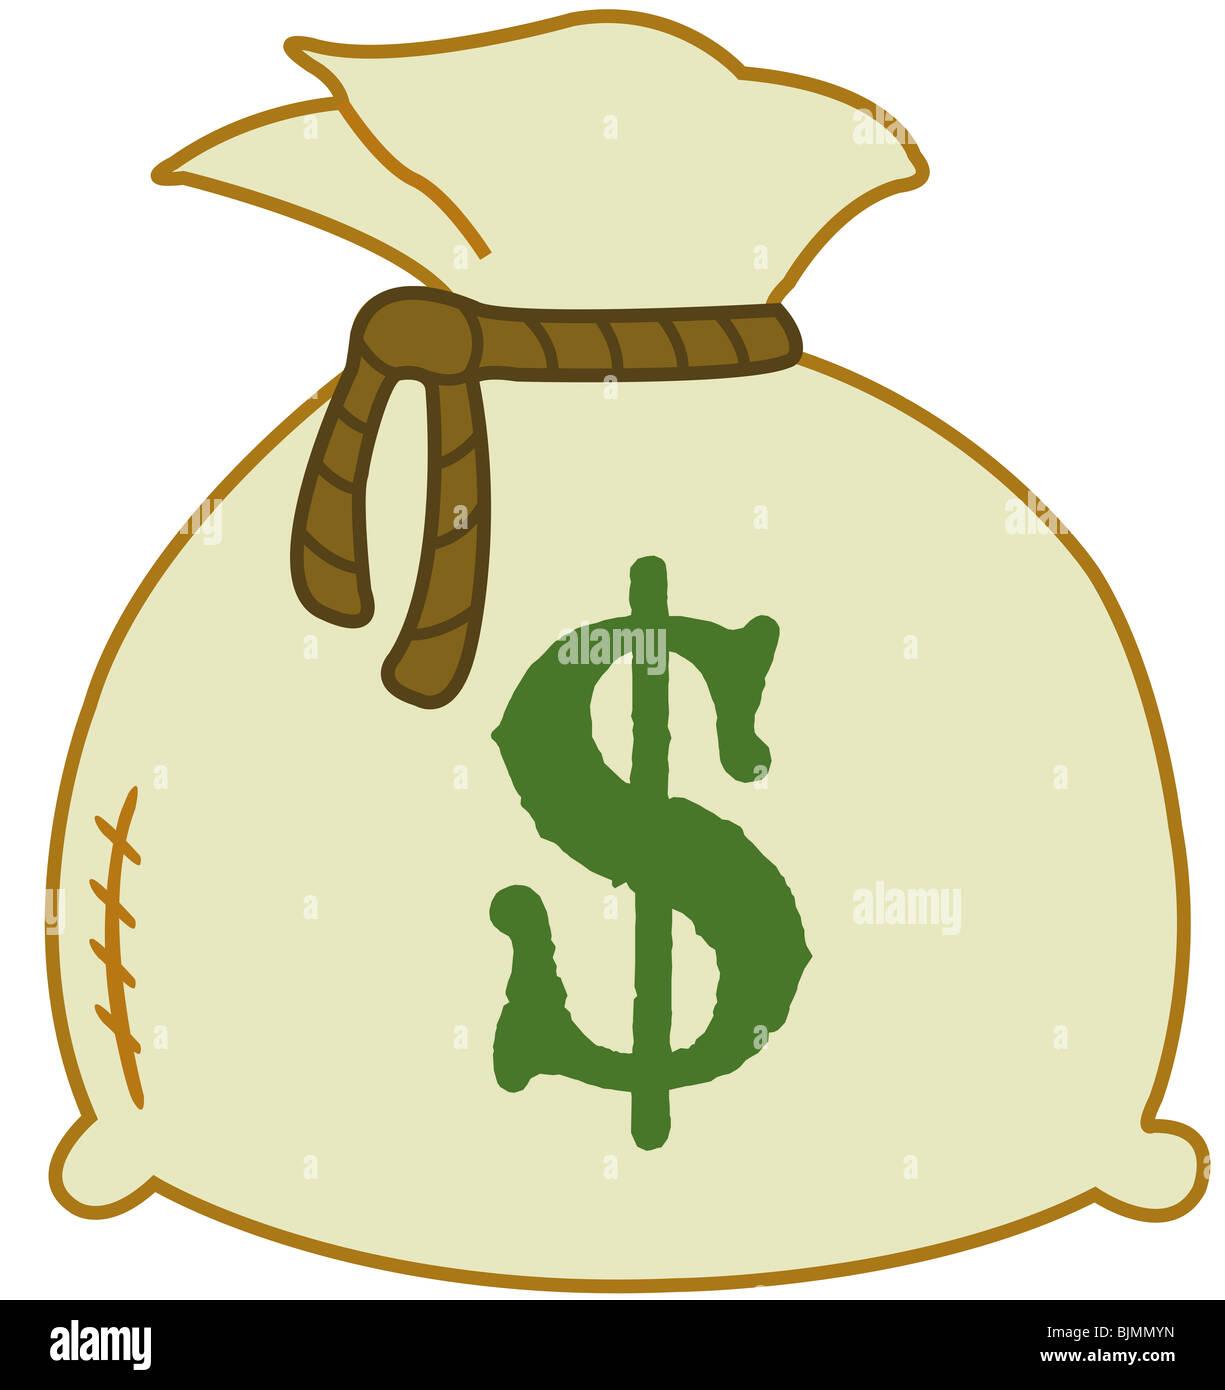 Money Bag With Euro Sign Illustration Stock Photo 28729673 Alamy